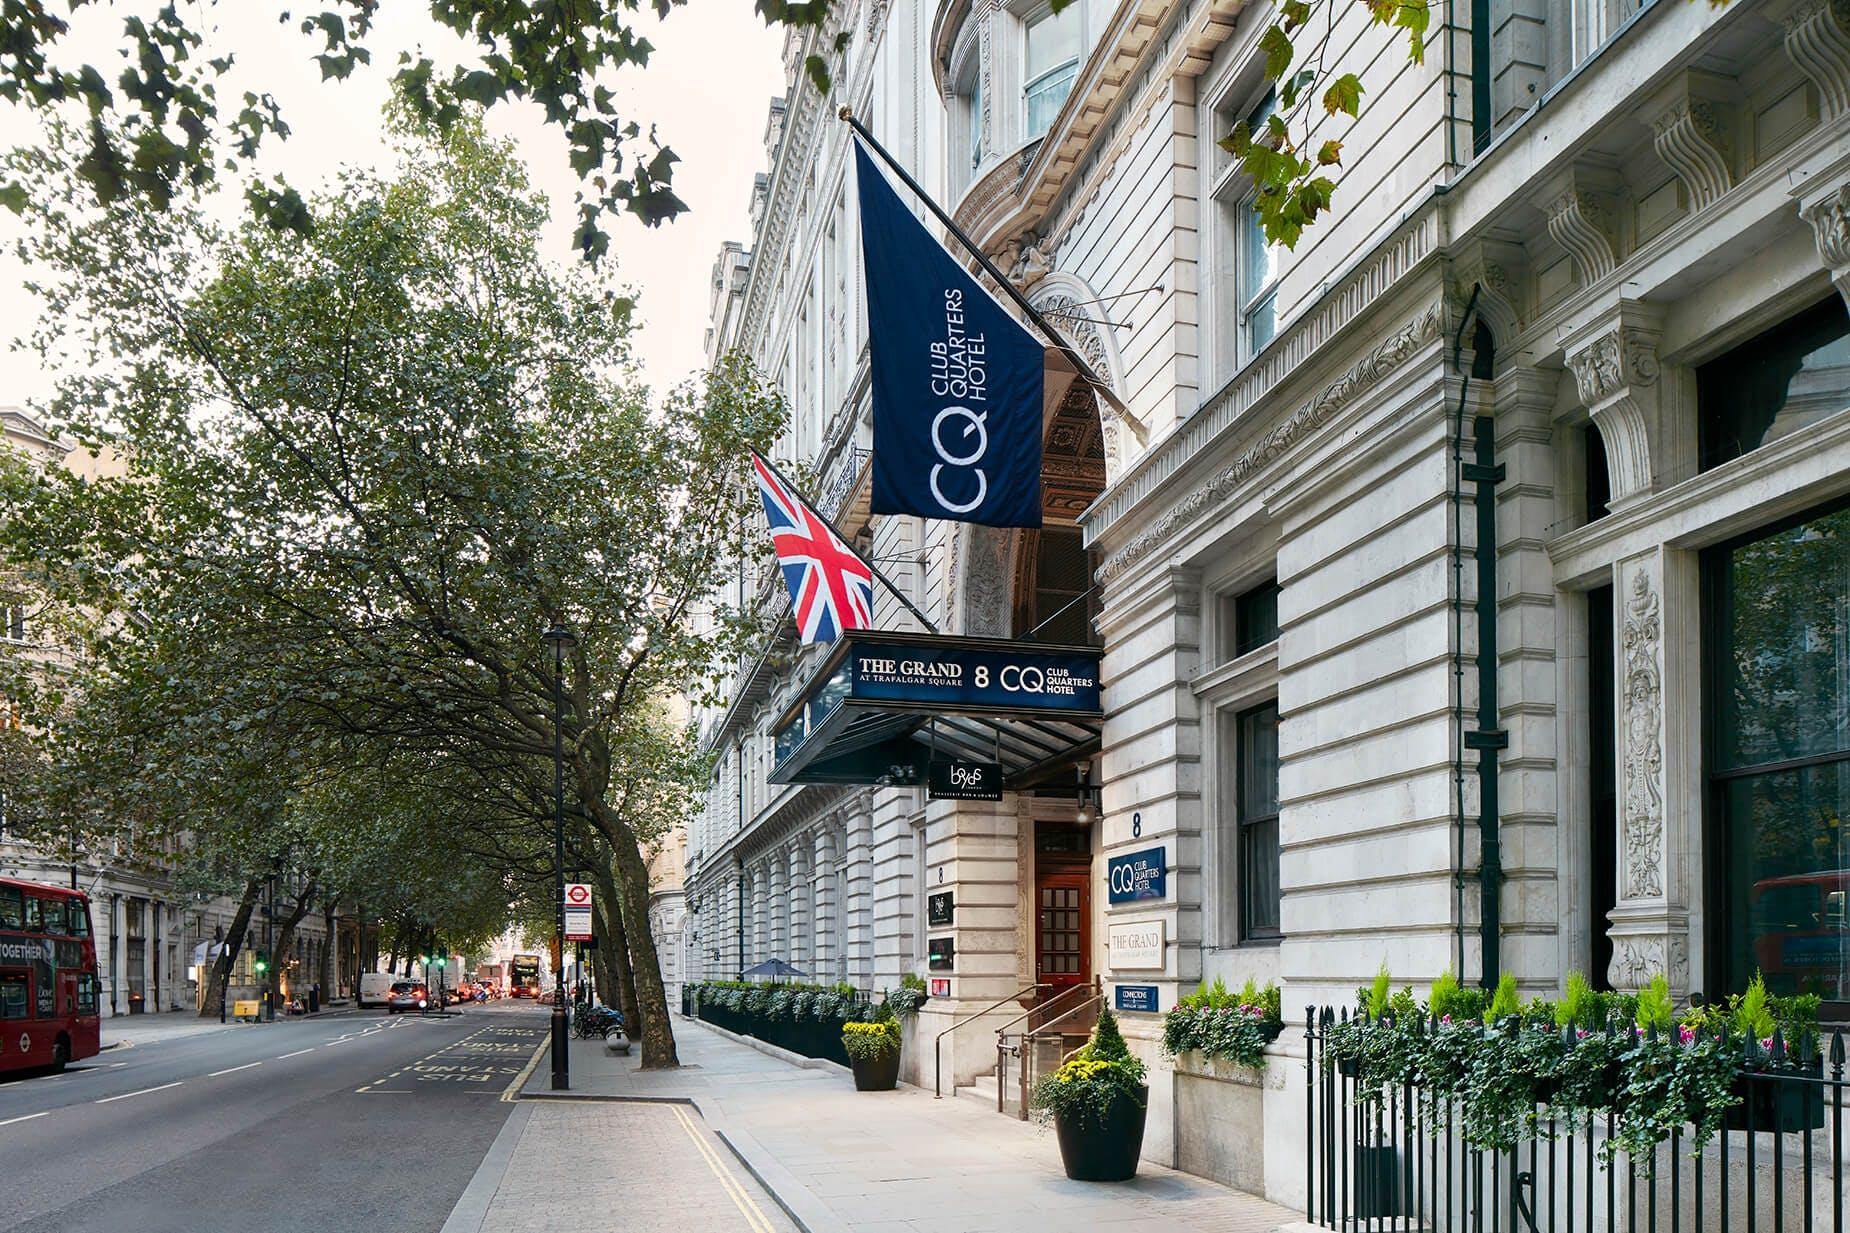 Cq Hotel London